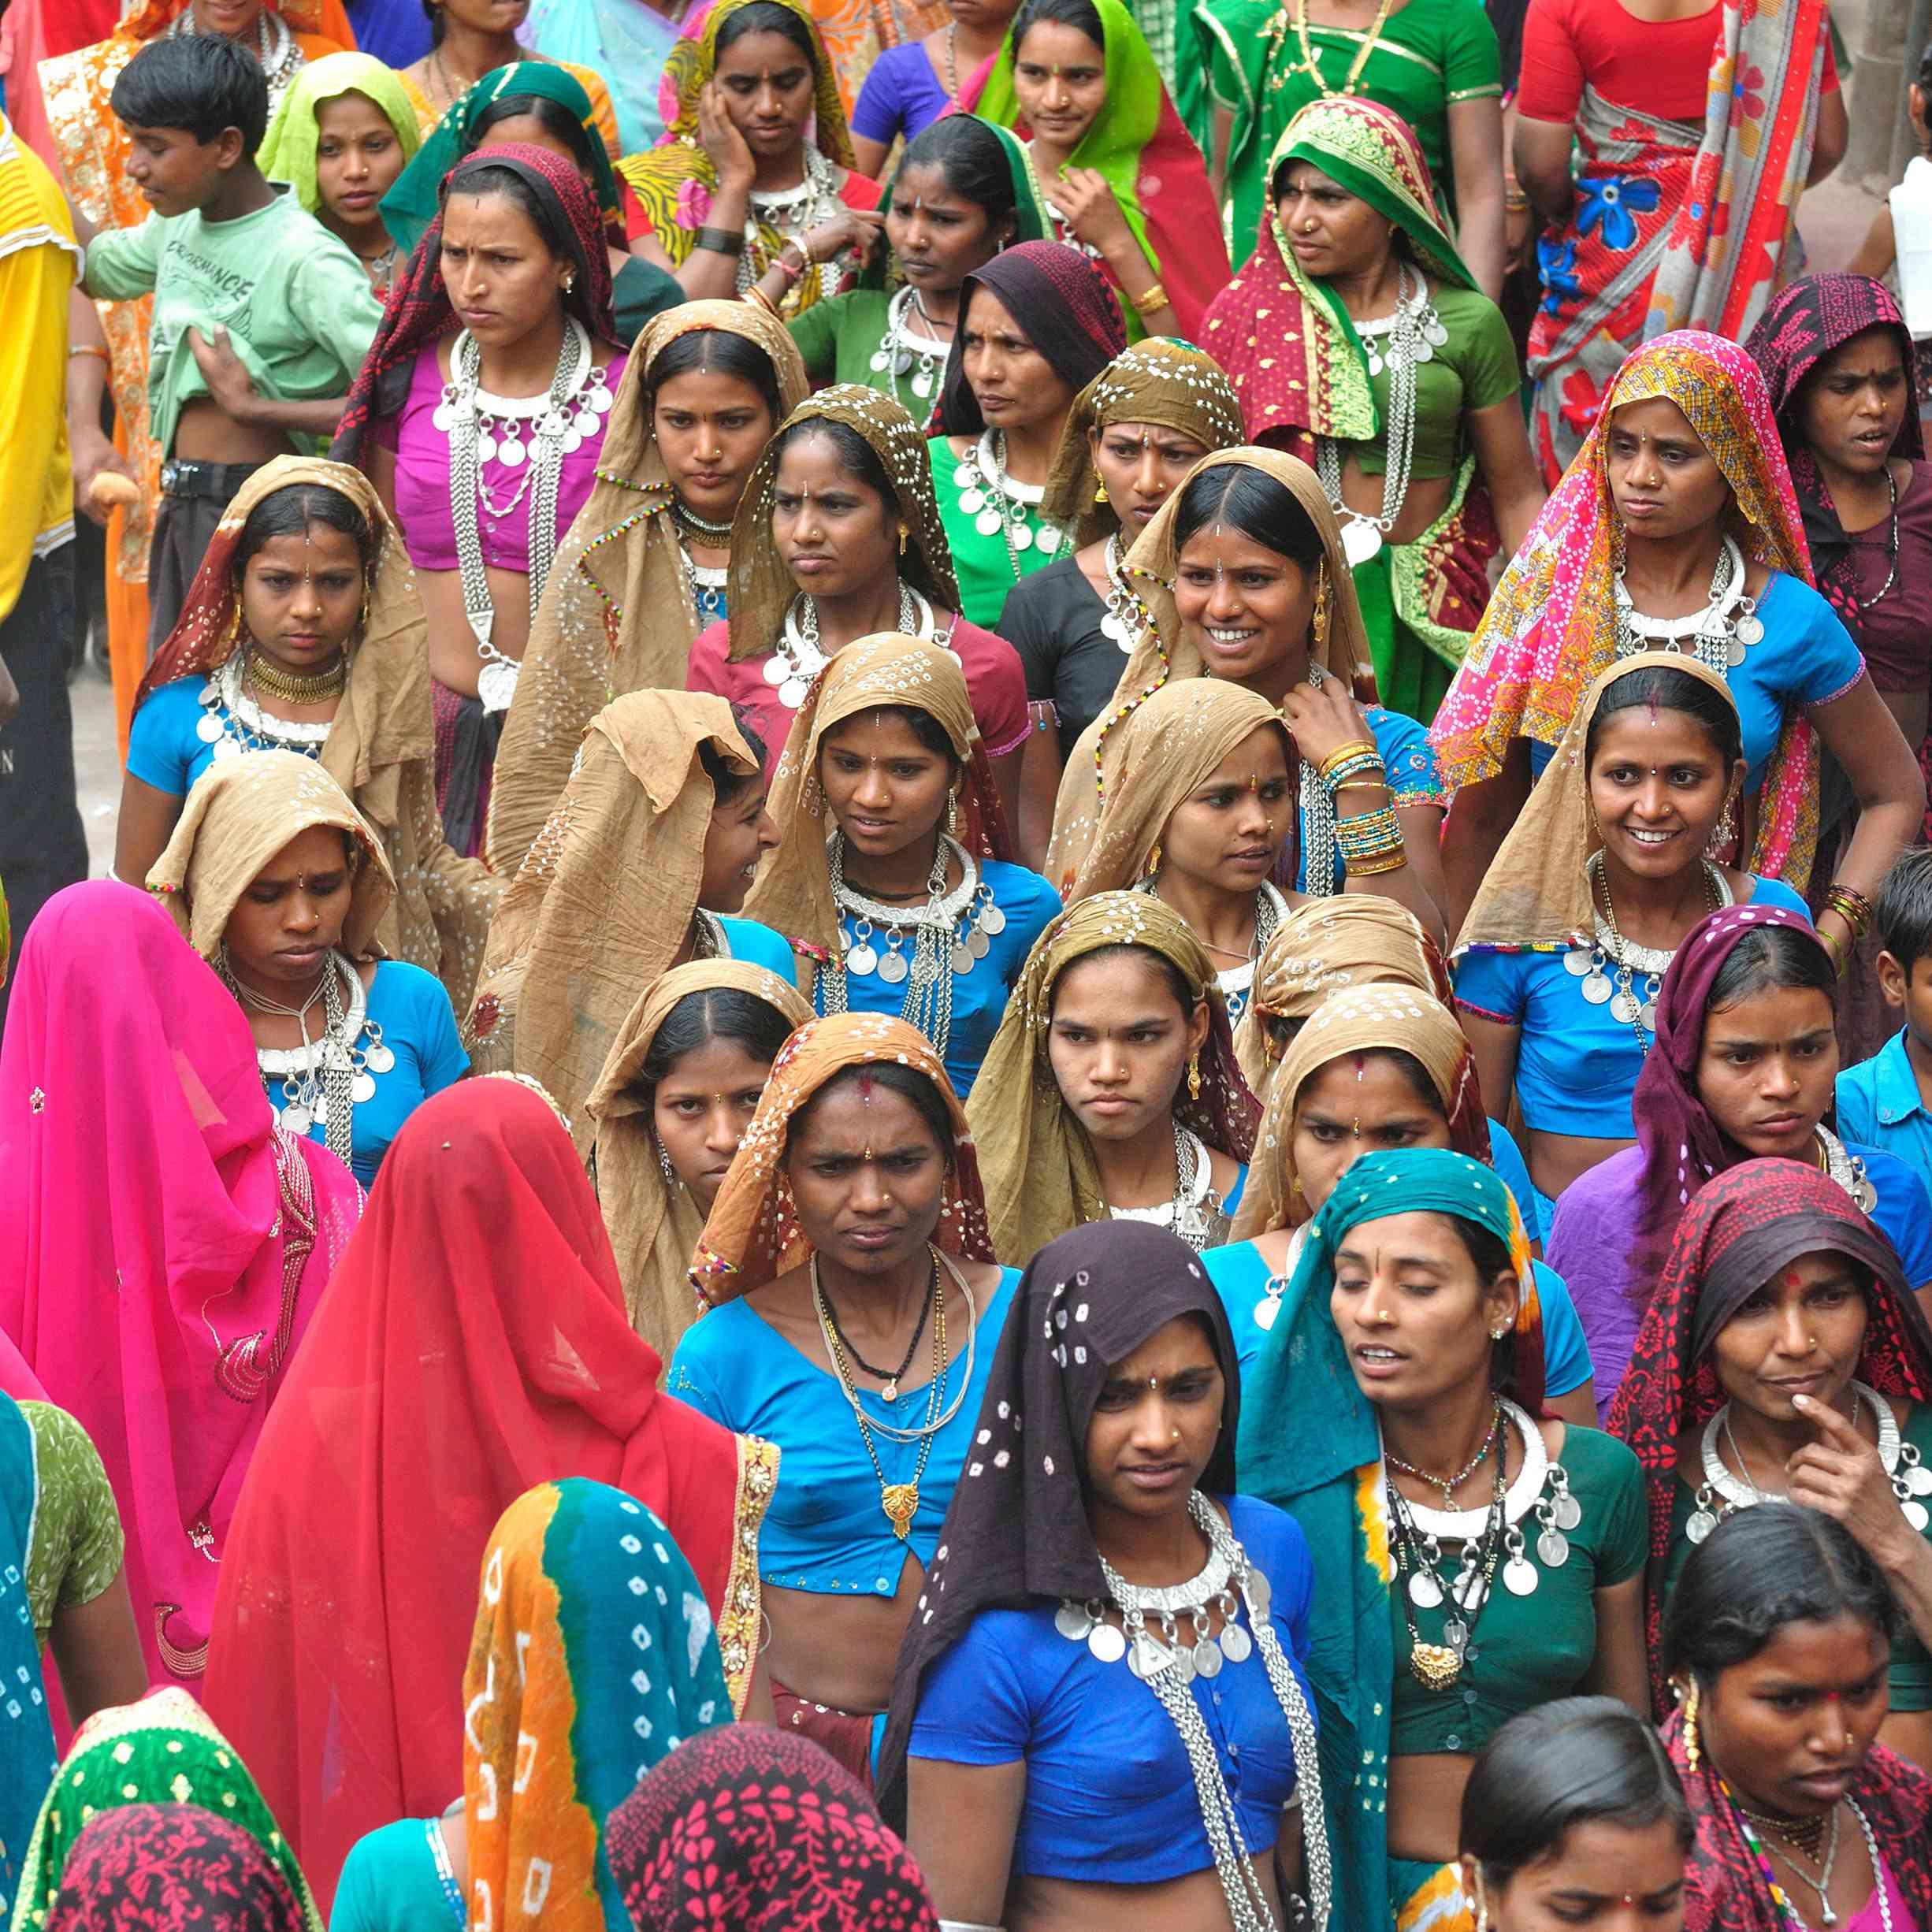 Tribals enjoying holi festival, Kawant, Gujarat, India